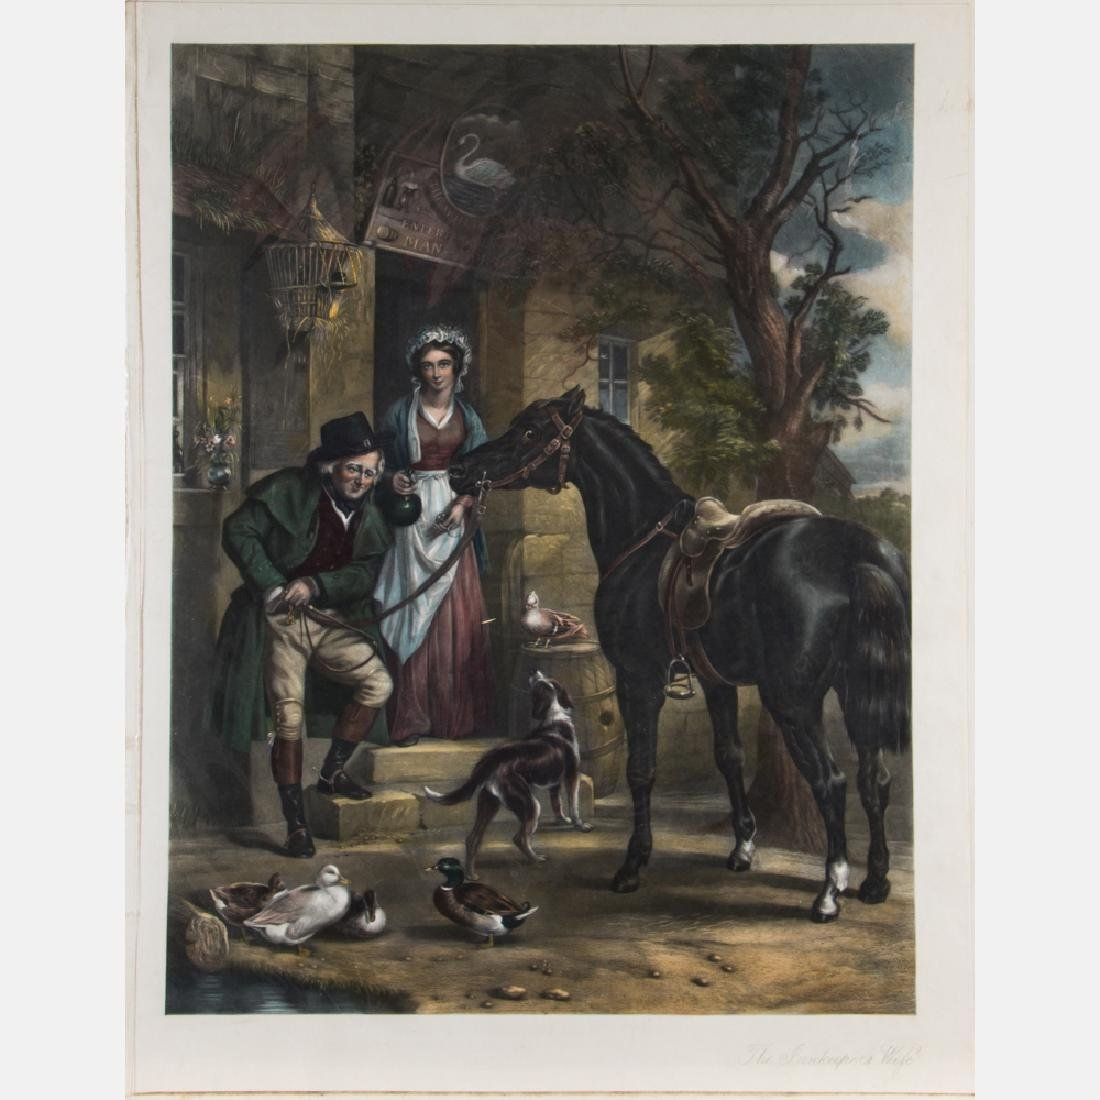 Artist Unknown (English, 19th Century) The Innkeeper's